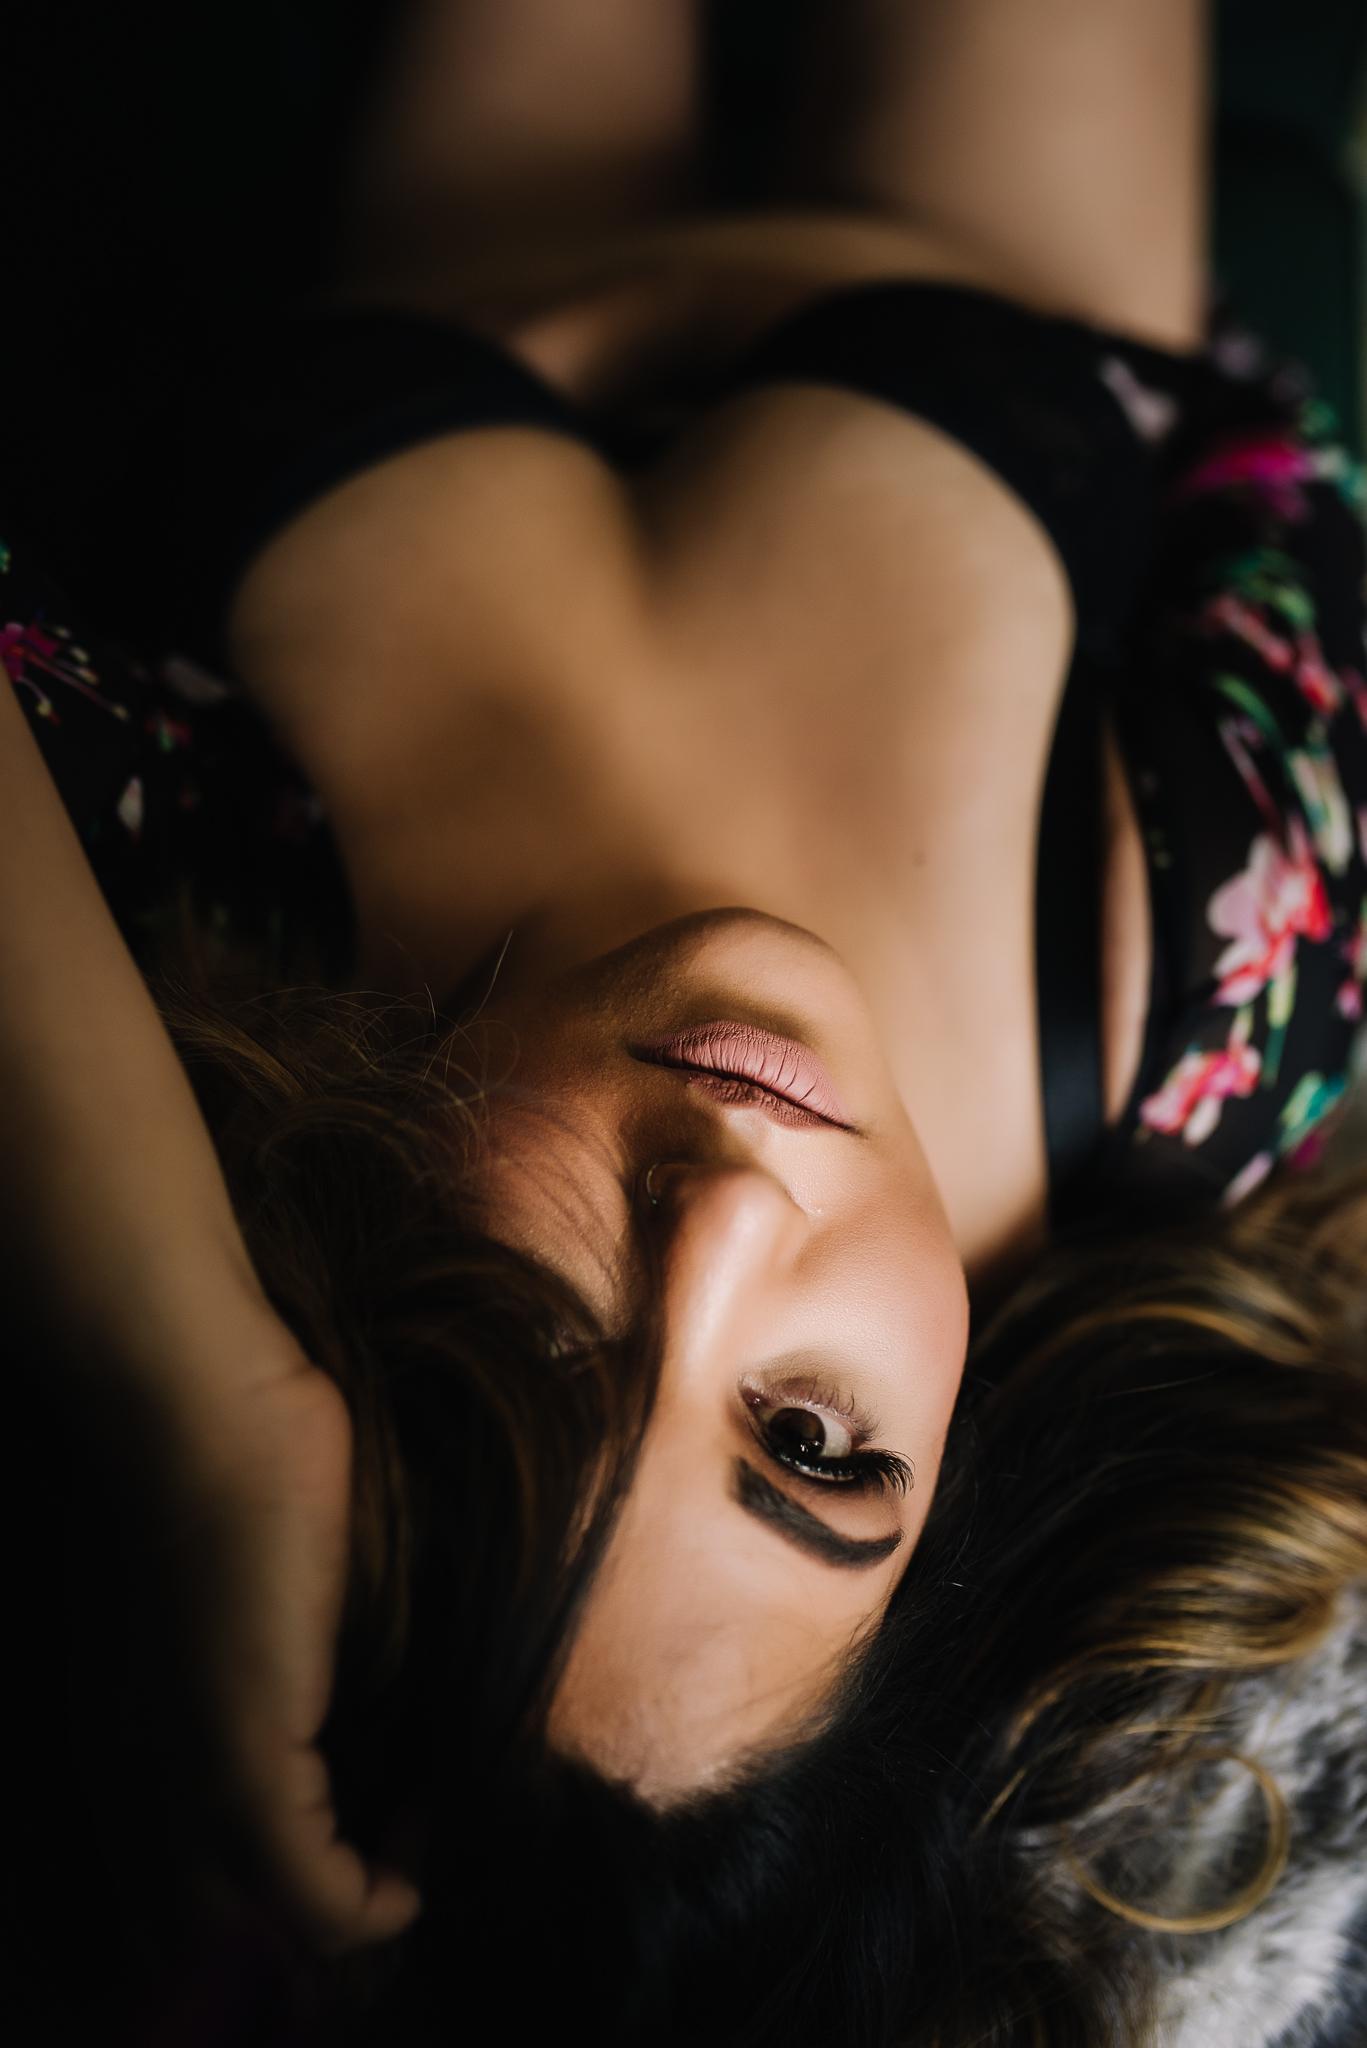 Calgary Boudoir Photographer, Shannon Smith Photography, boudoir photo shoot, lingerie photoshoot, Women's Empowerment, Body Diversity, Body Positivity, Self Love